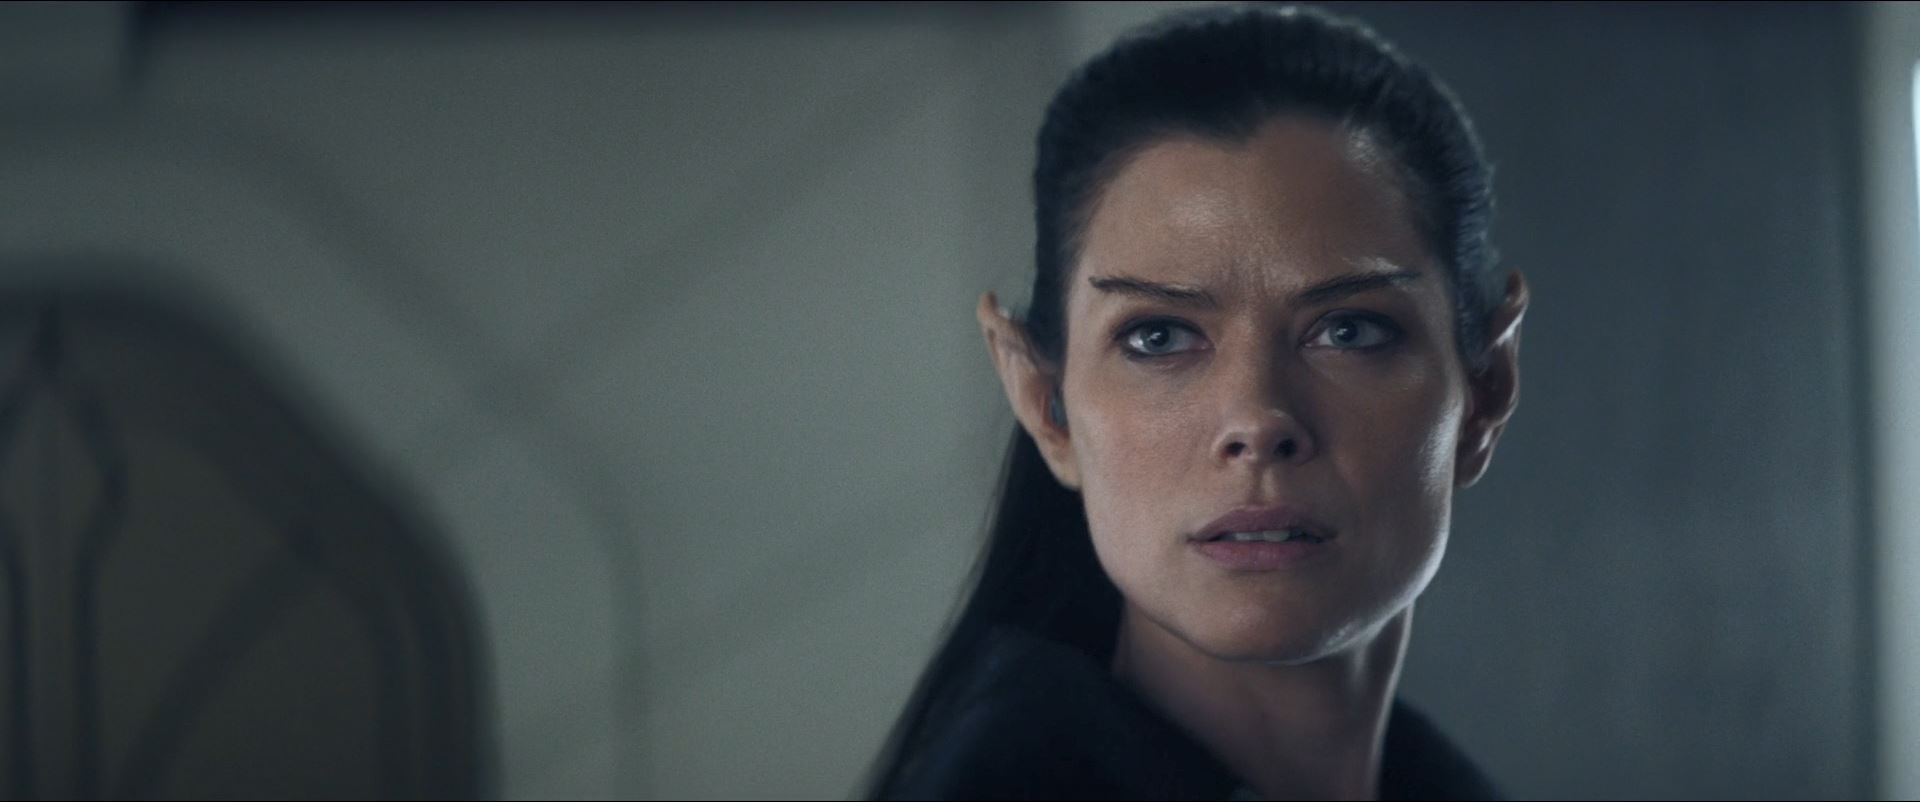 Star Trek Picard S01E06 Review - Narissa played by Peytonn List